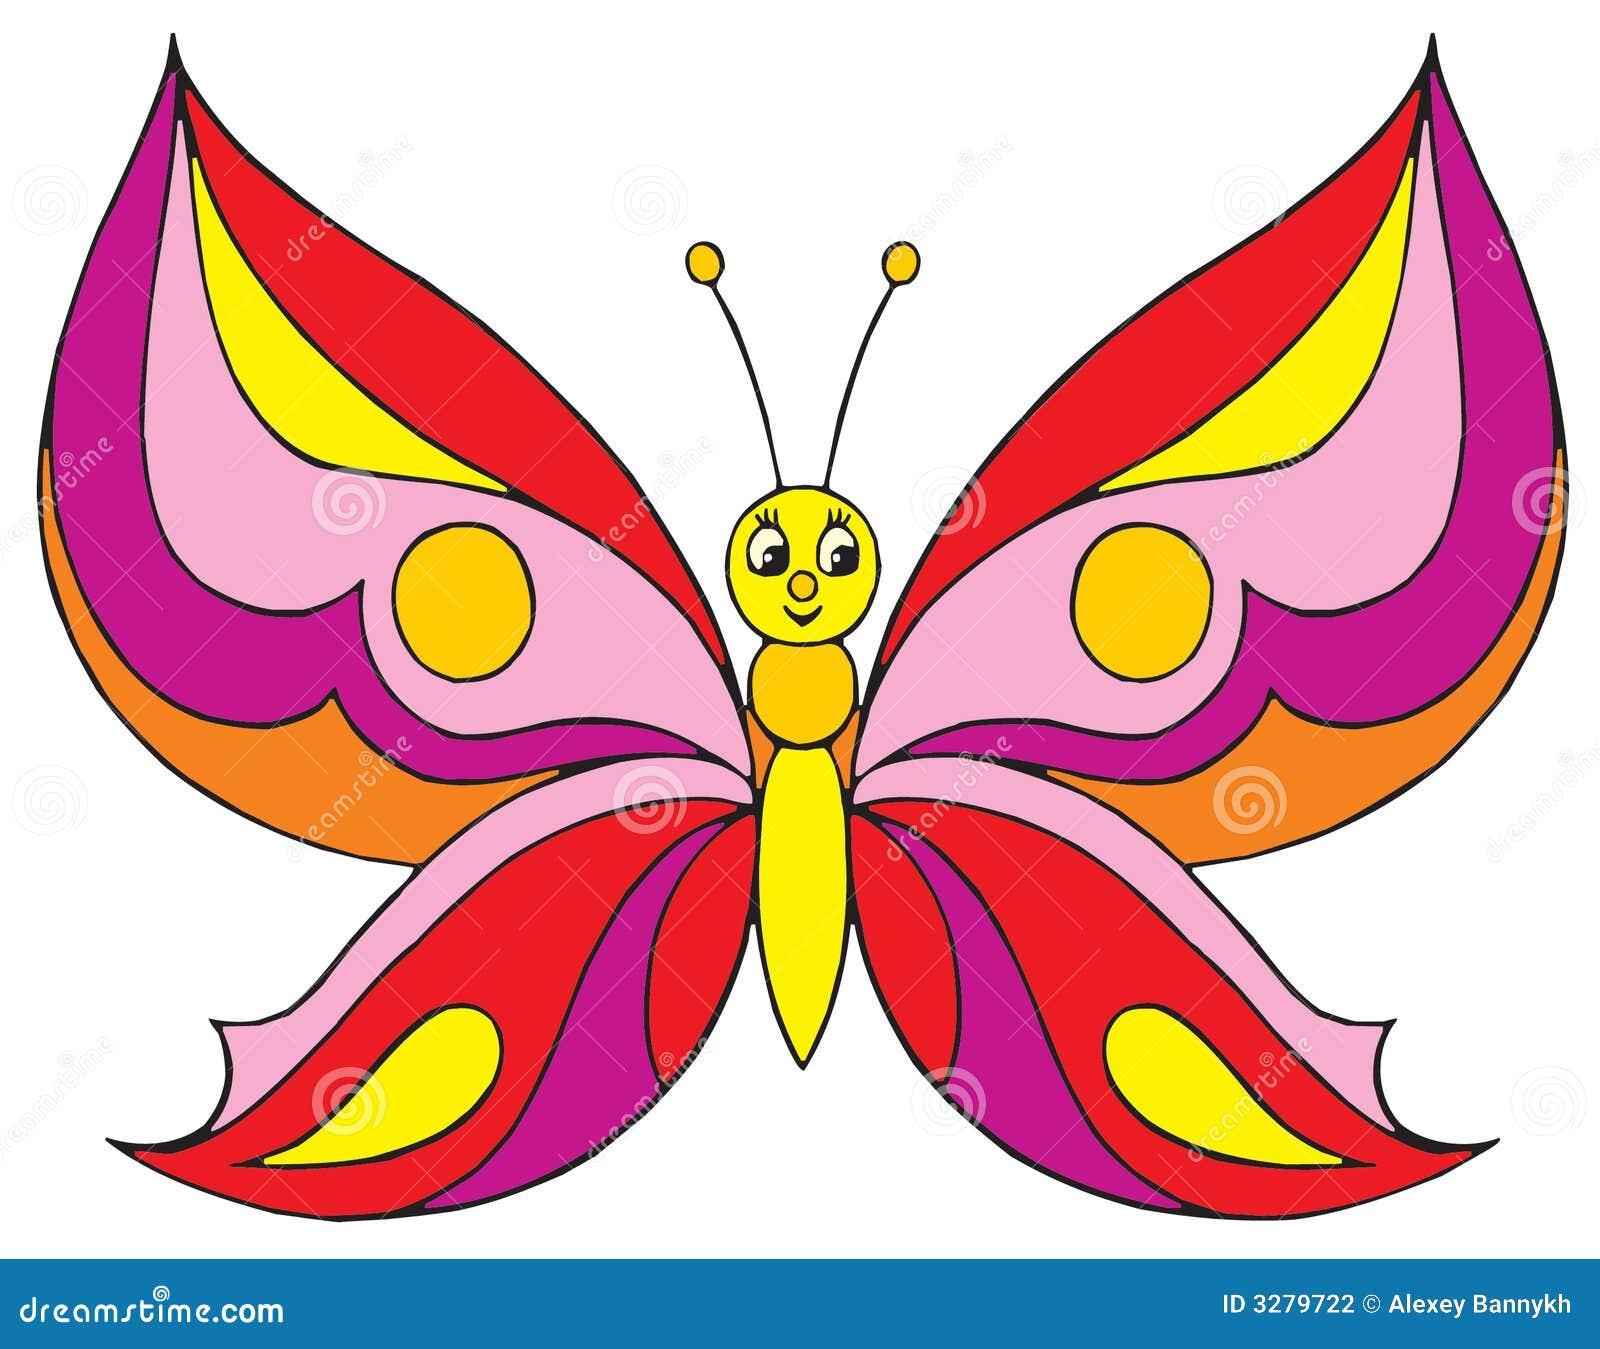 butterfly vector clip art stock vector illustration of game rh dreamstime com Rabbit Clip Art Dreamstime Santa Clip Art Dreamstime